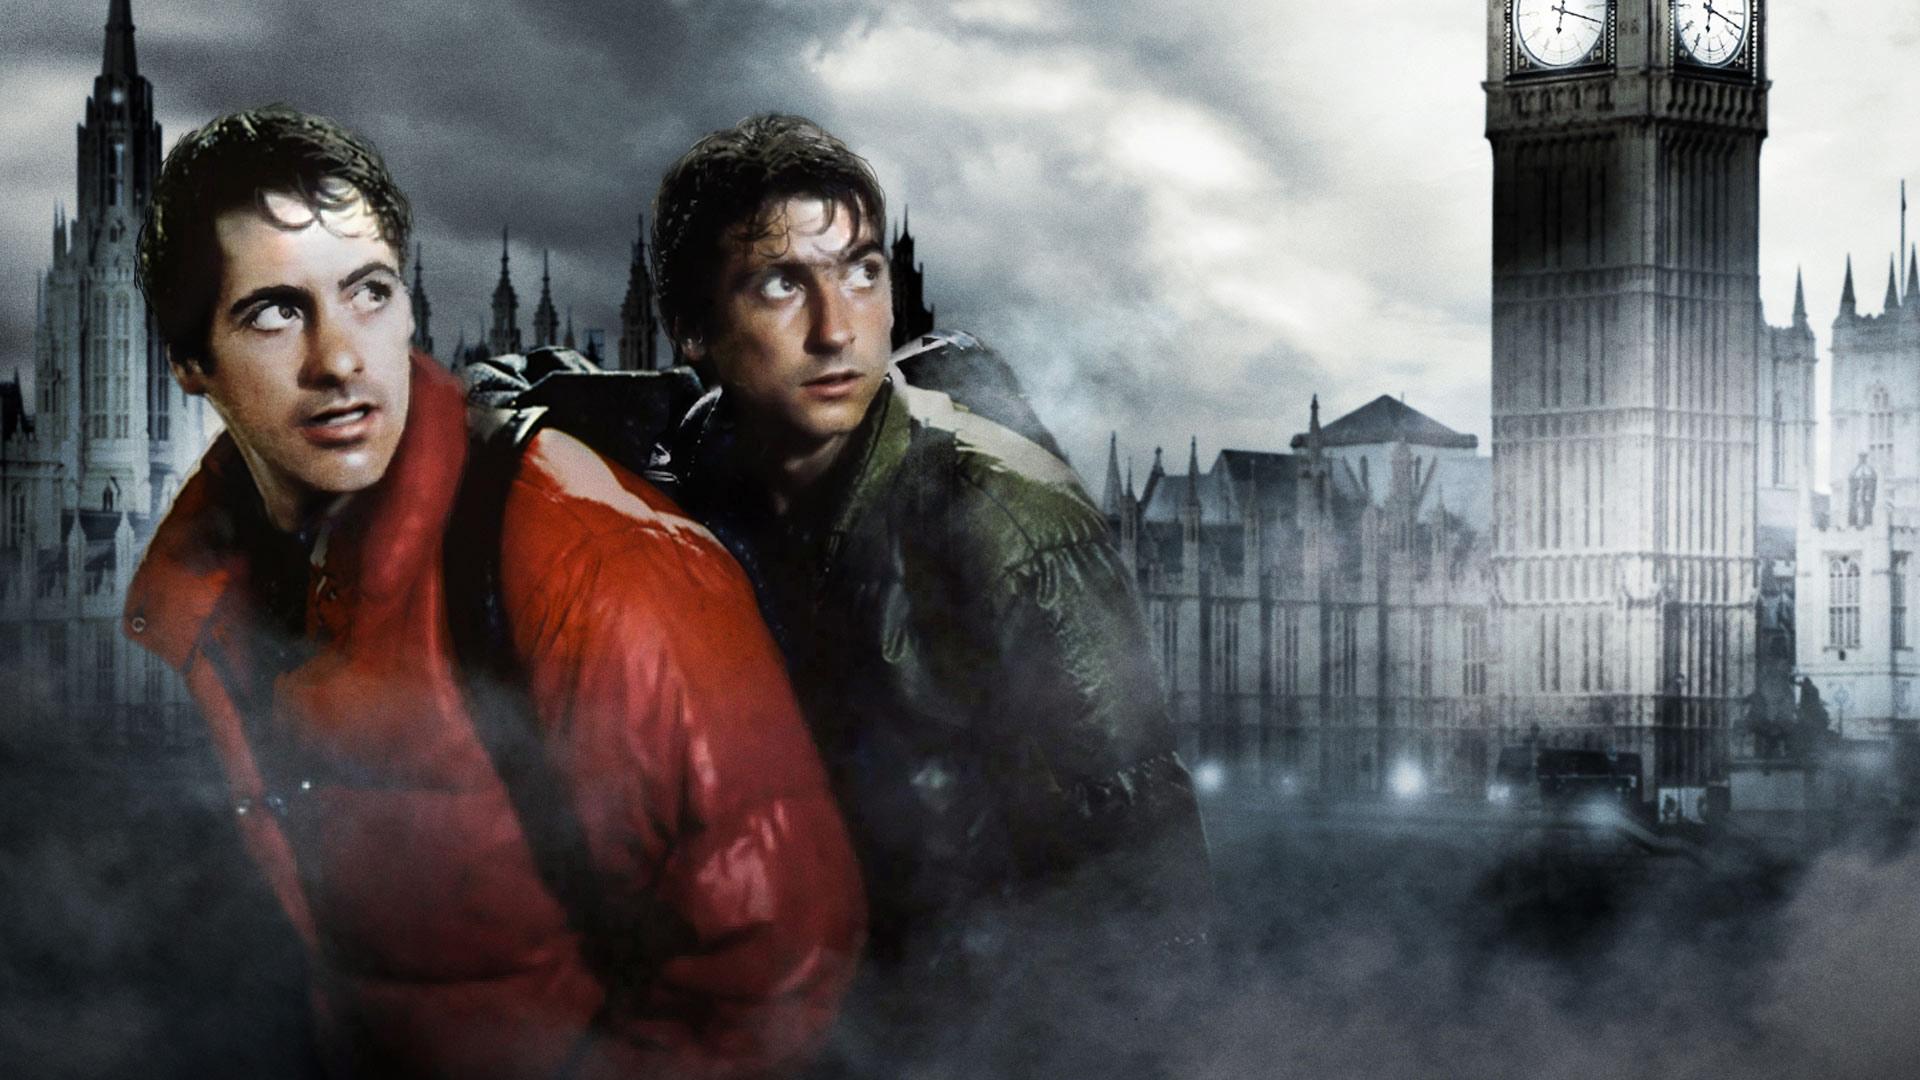 Prime Video An American Werewolf In London